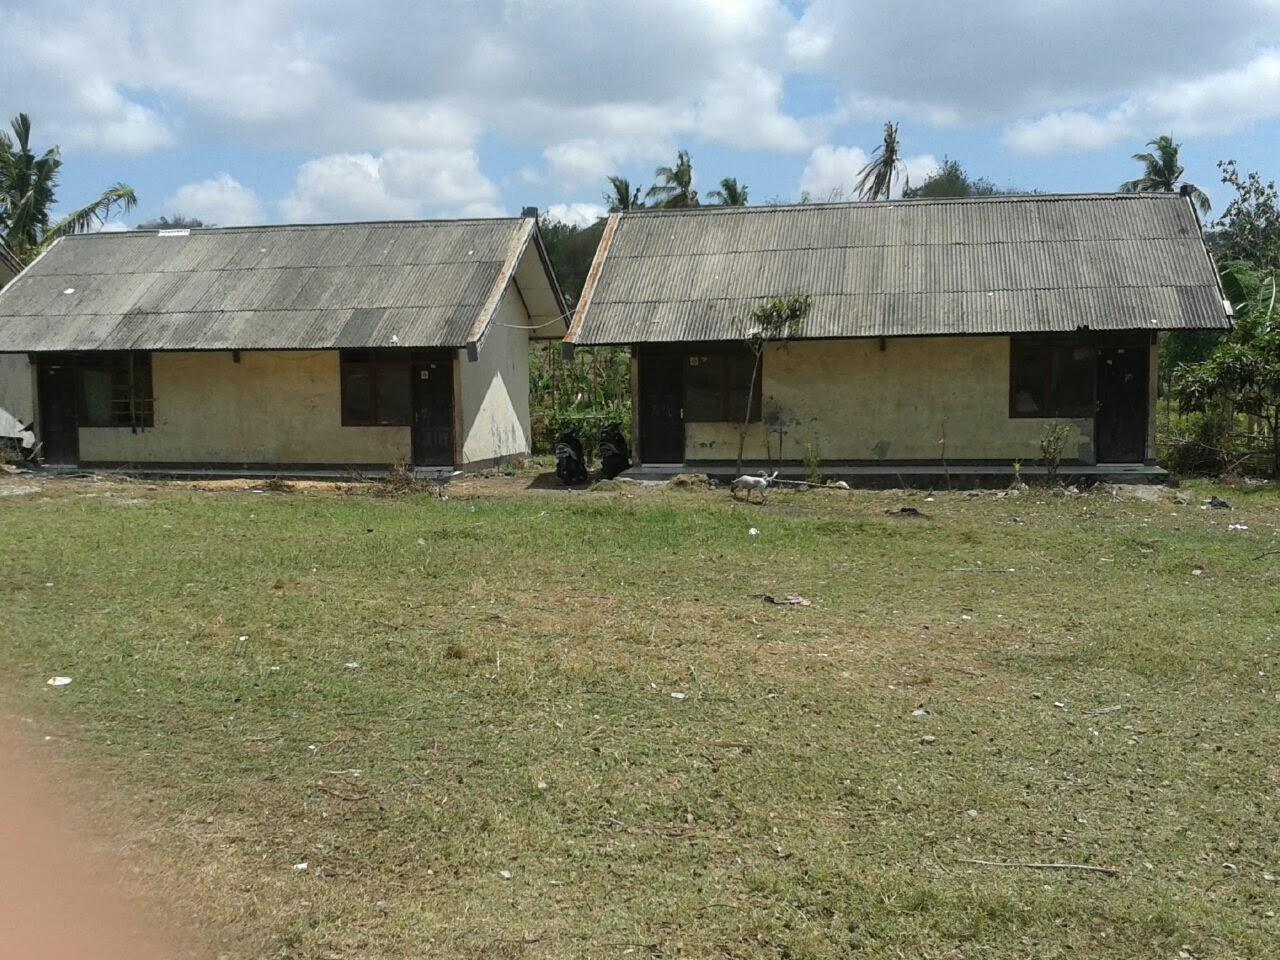 pendidikan di desa terpencil